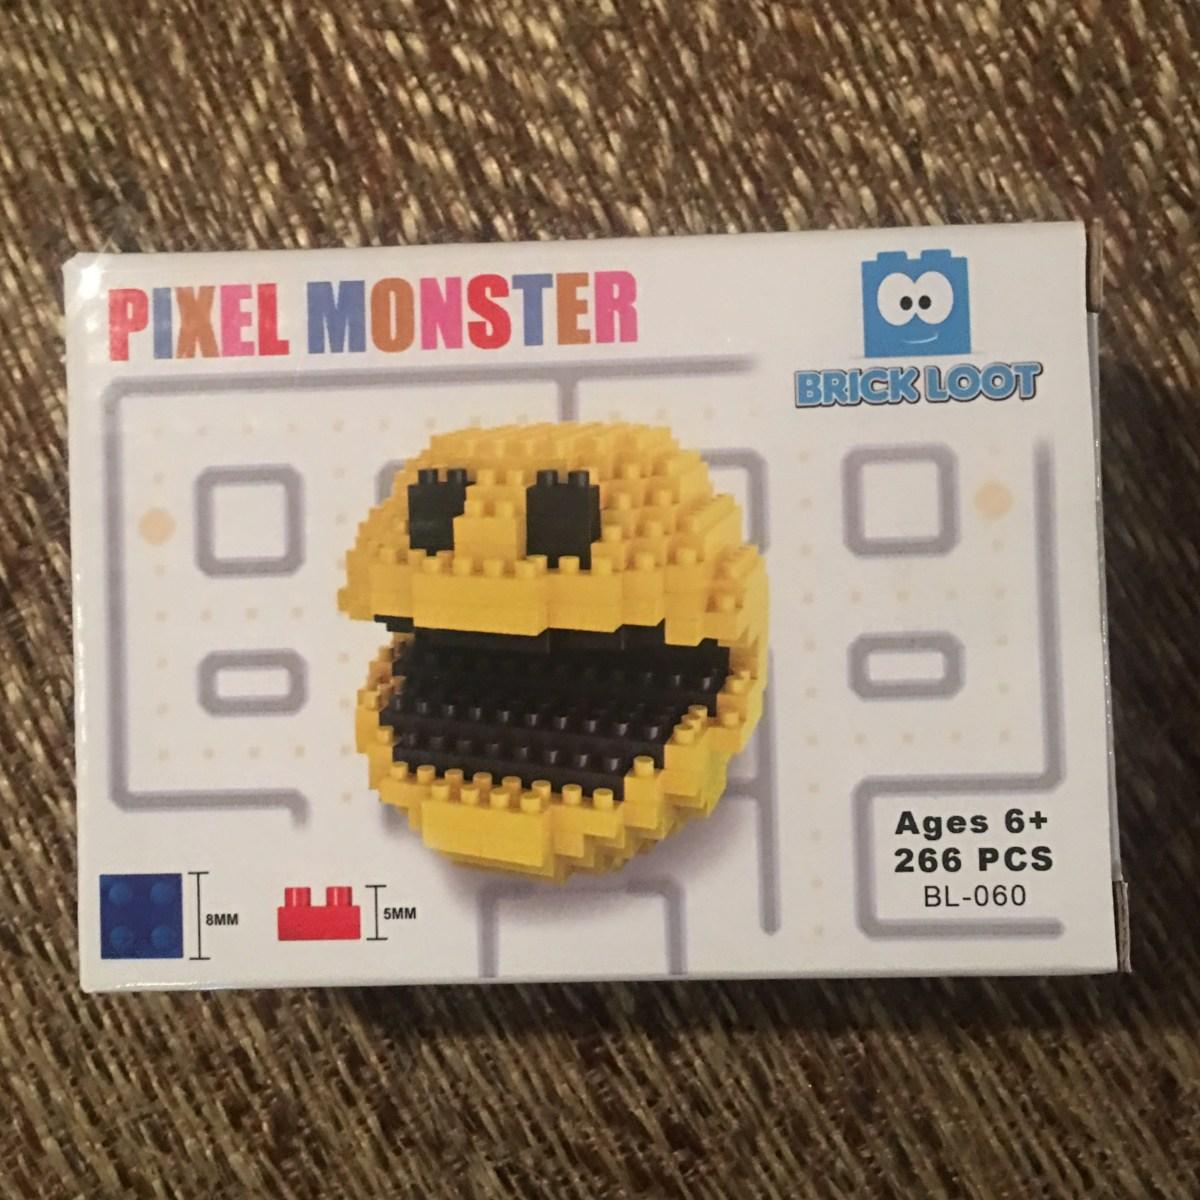 Brick Loot October Box Pixel Monster